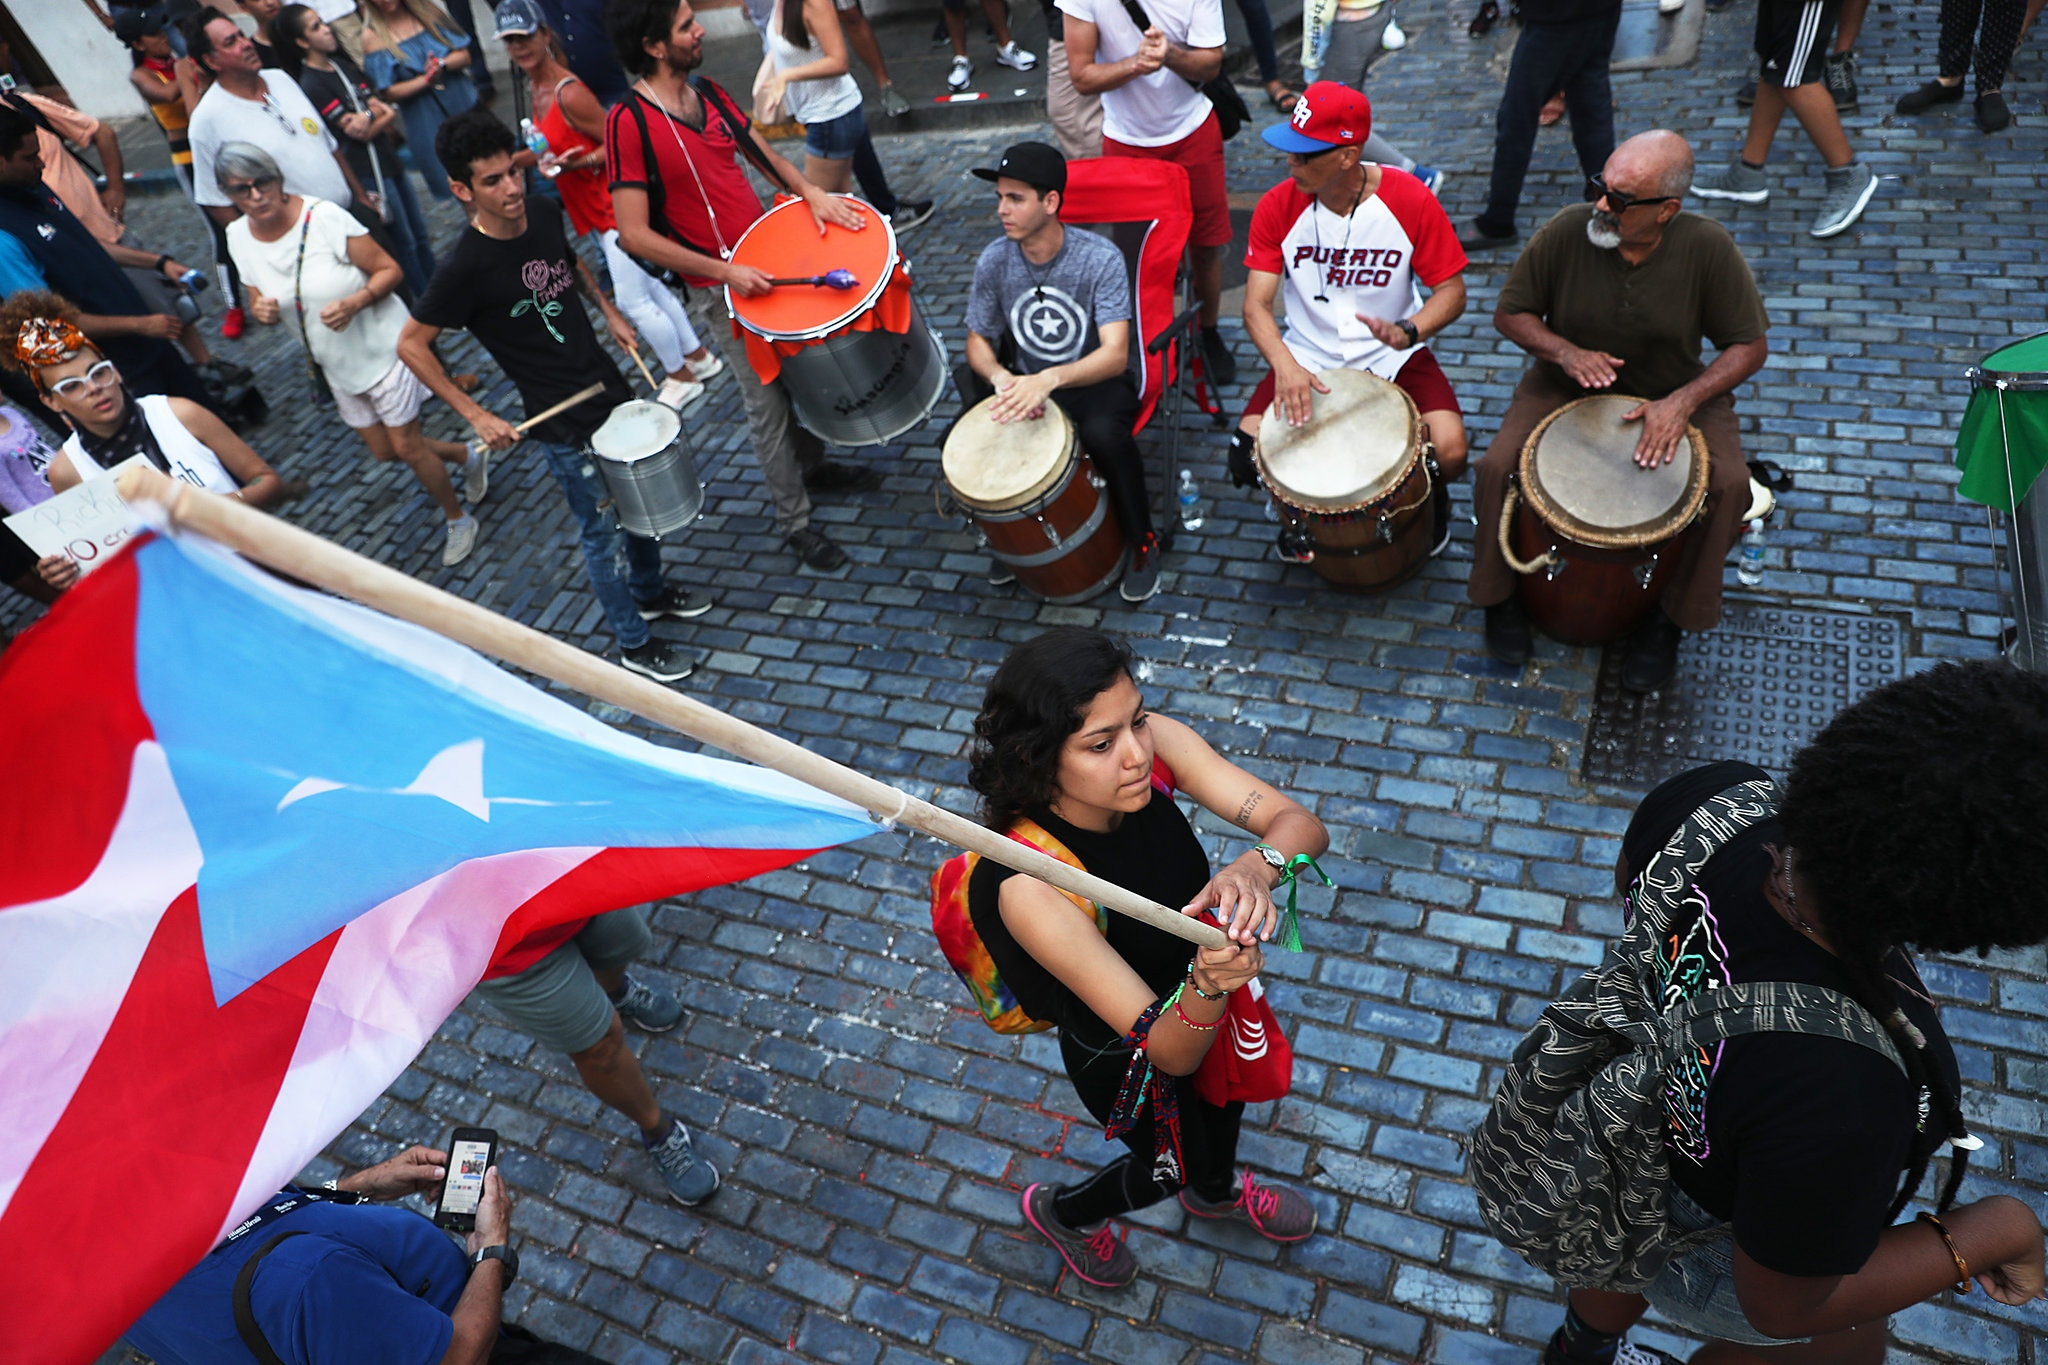 puerto rico protest.jpg